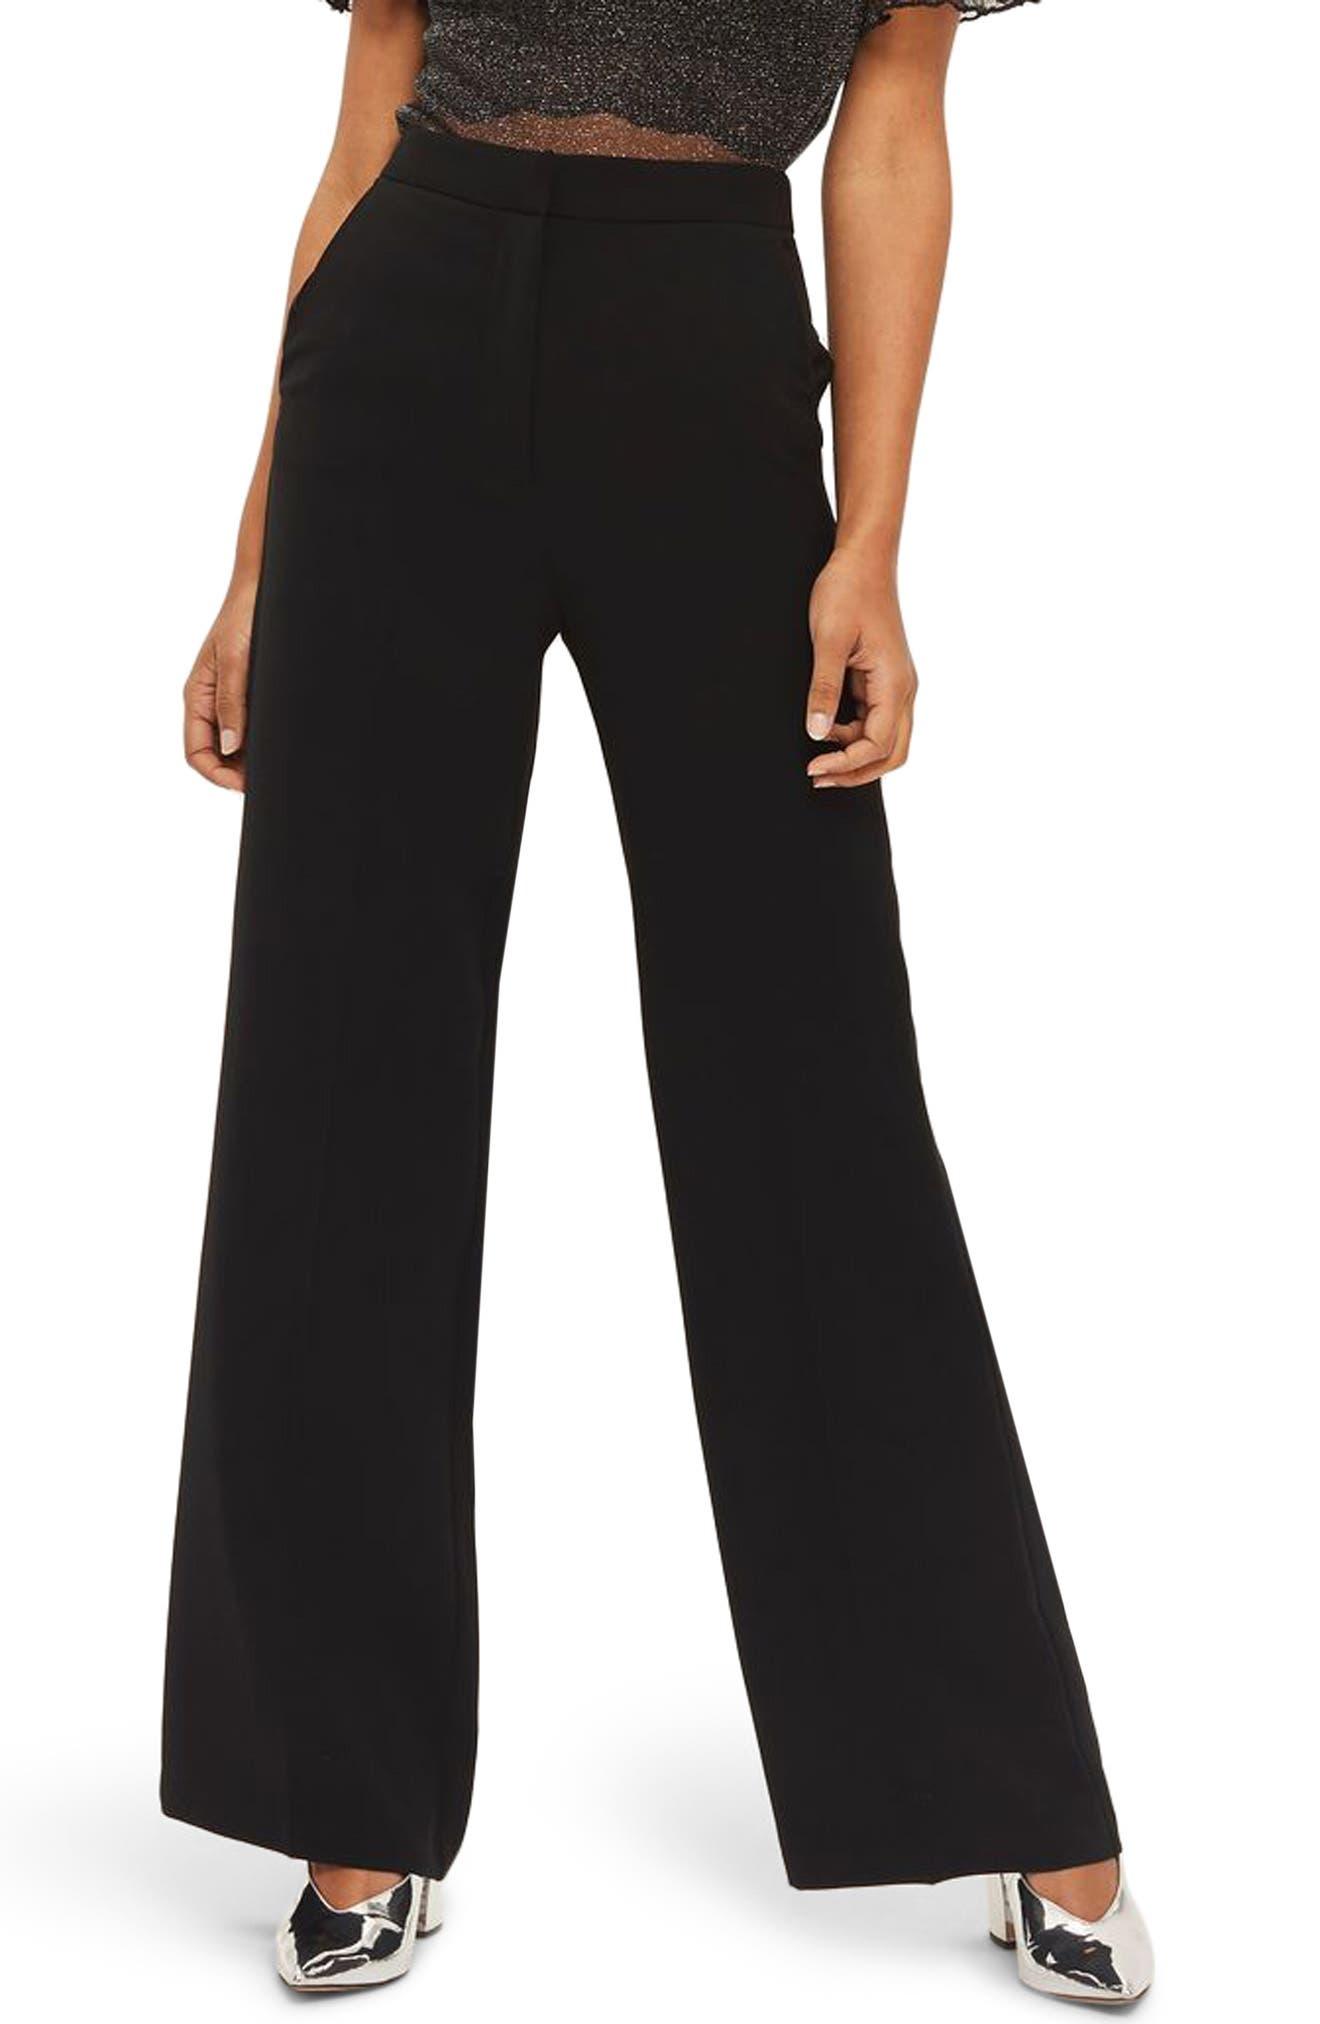 Wide Leg Womens Pants xb8iWk6t